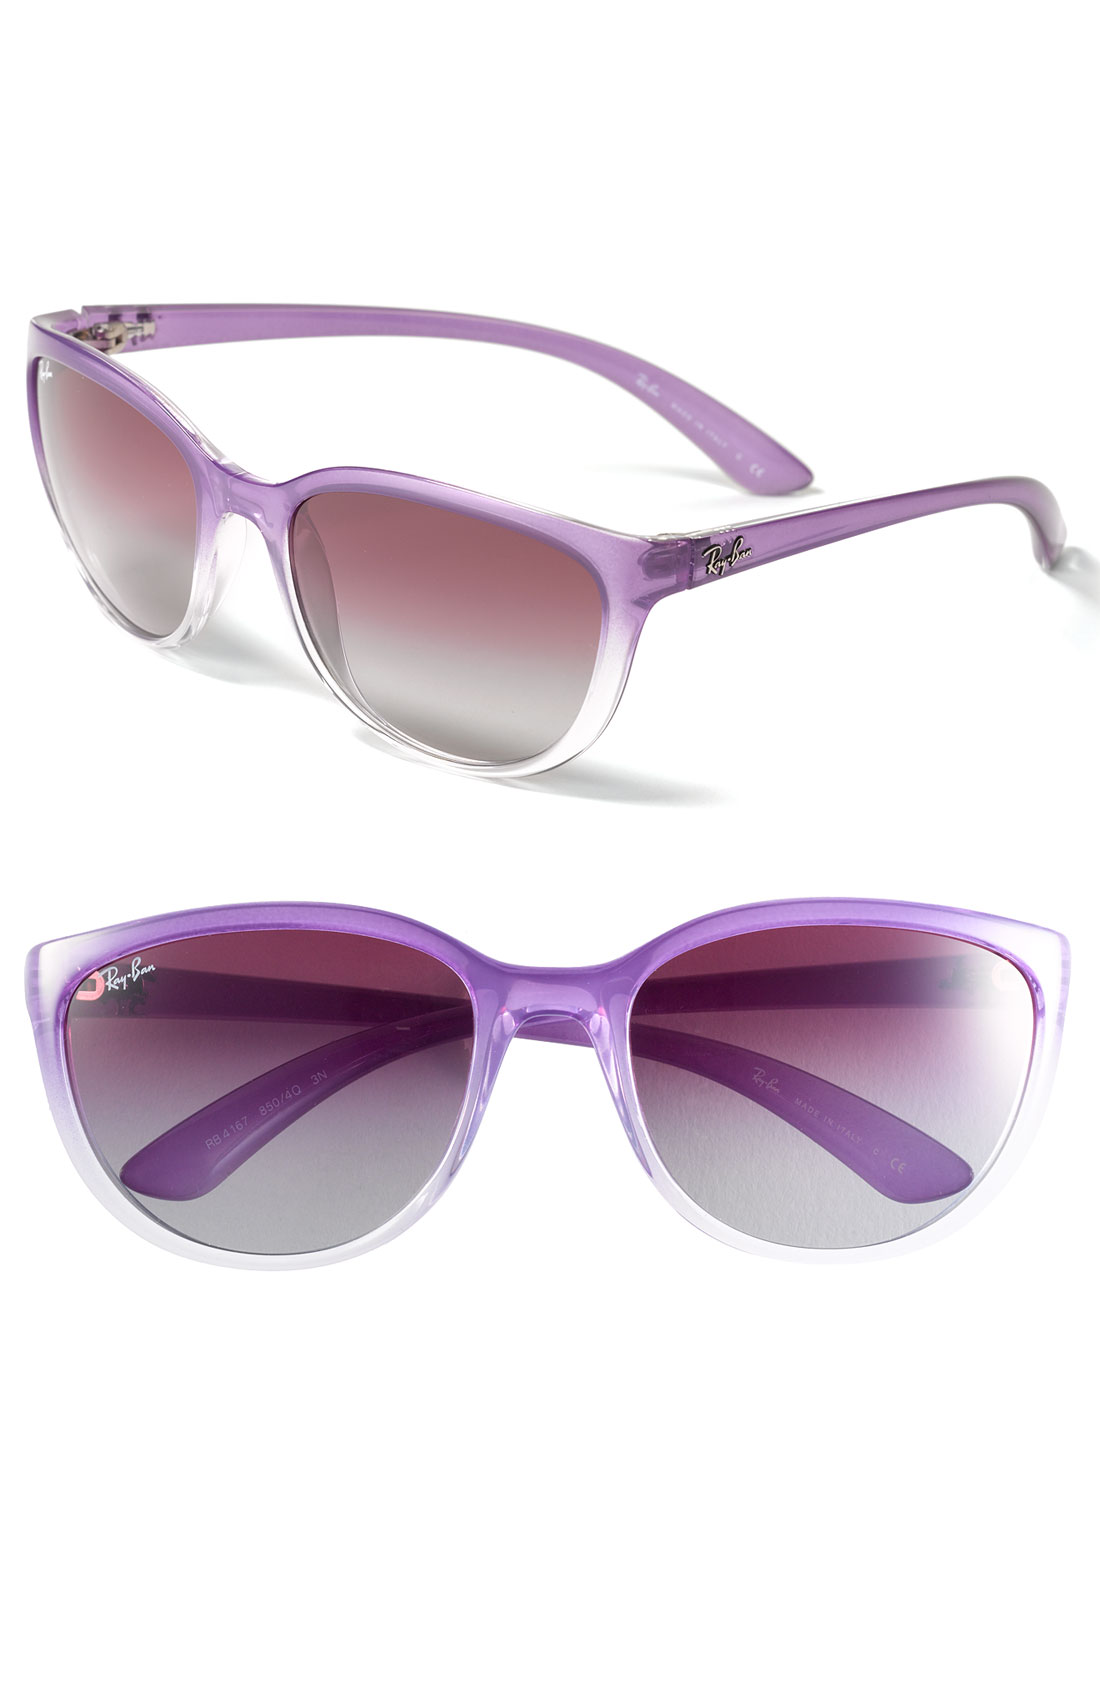 ray ban cats eye sunglasses in purple purple gradient lyst. Black Bedroom Furniture Sets. Home Design Ideas